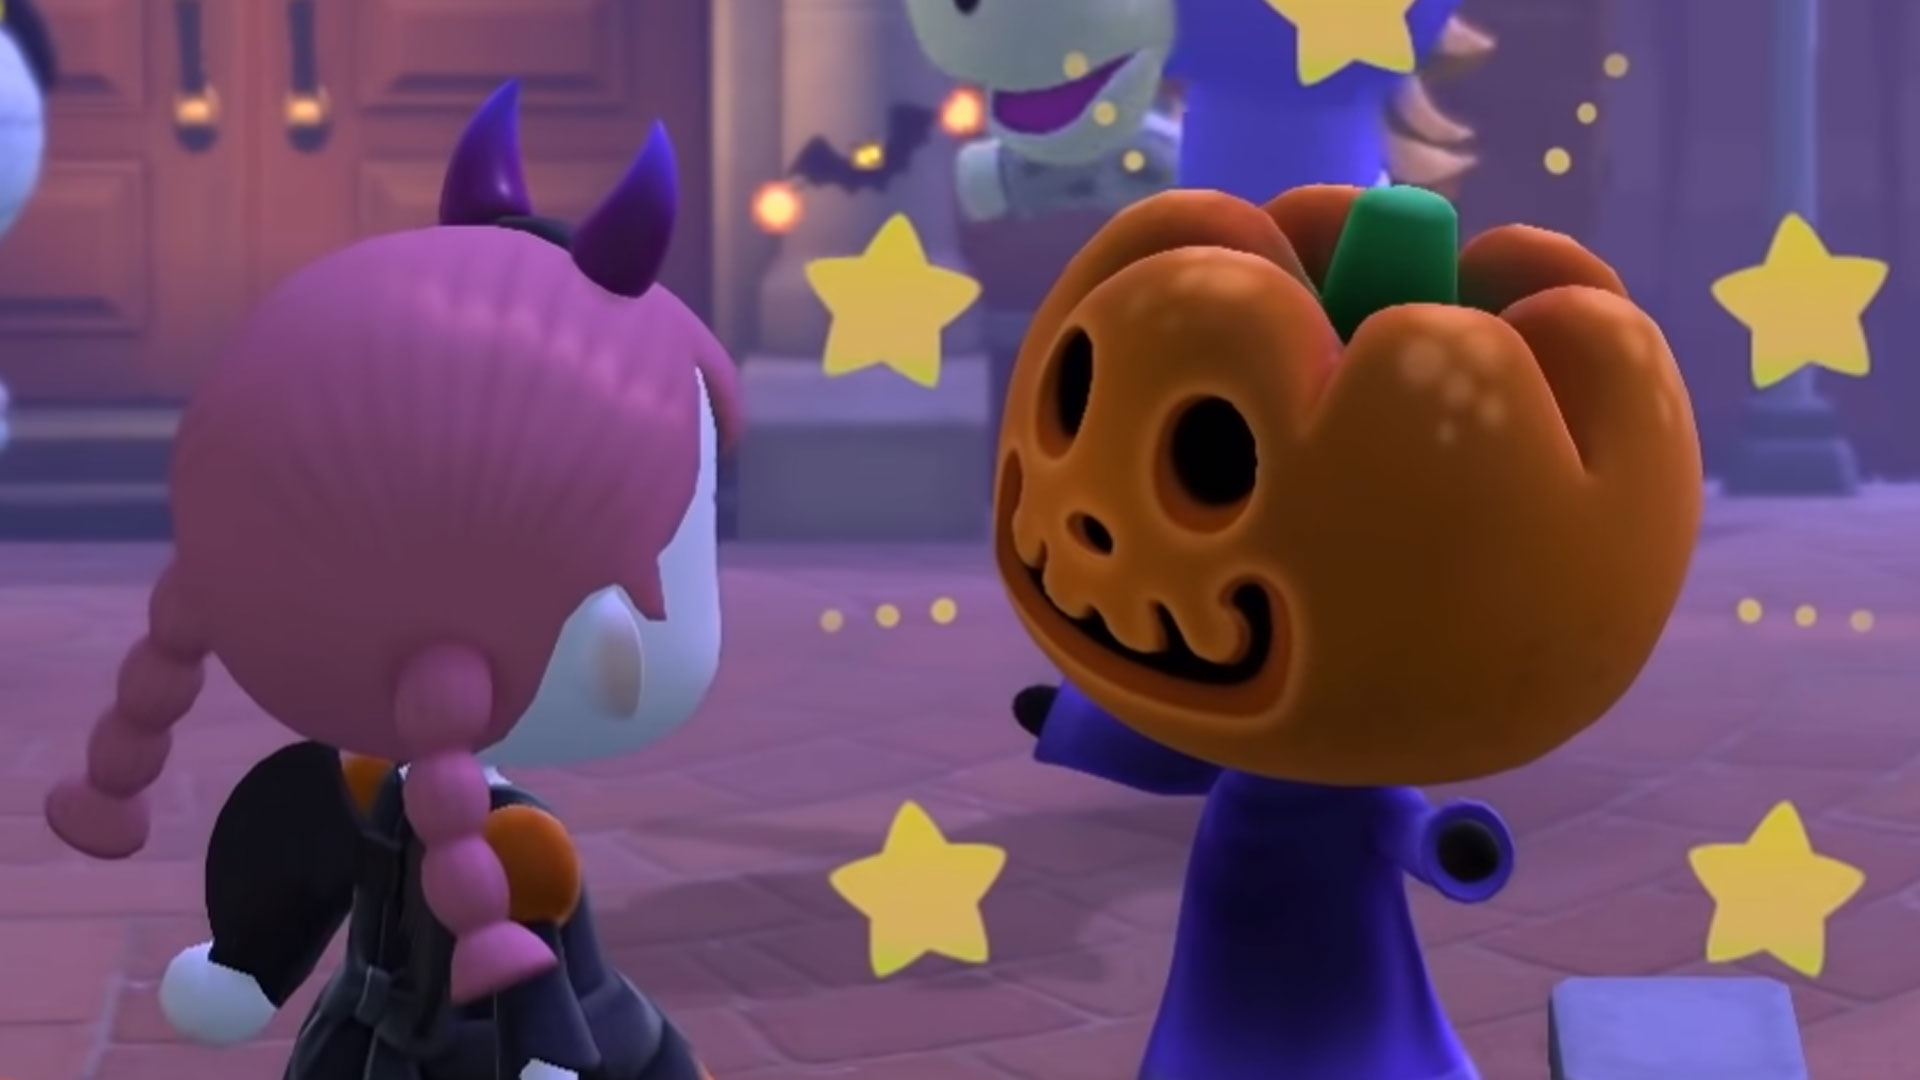 Ultima Online Halloween Custumes 2020 Animal Crossing: New Horizons Fall update   the best Halloween